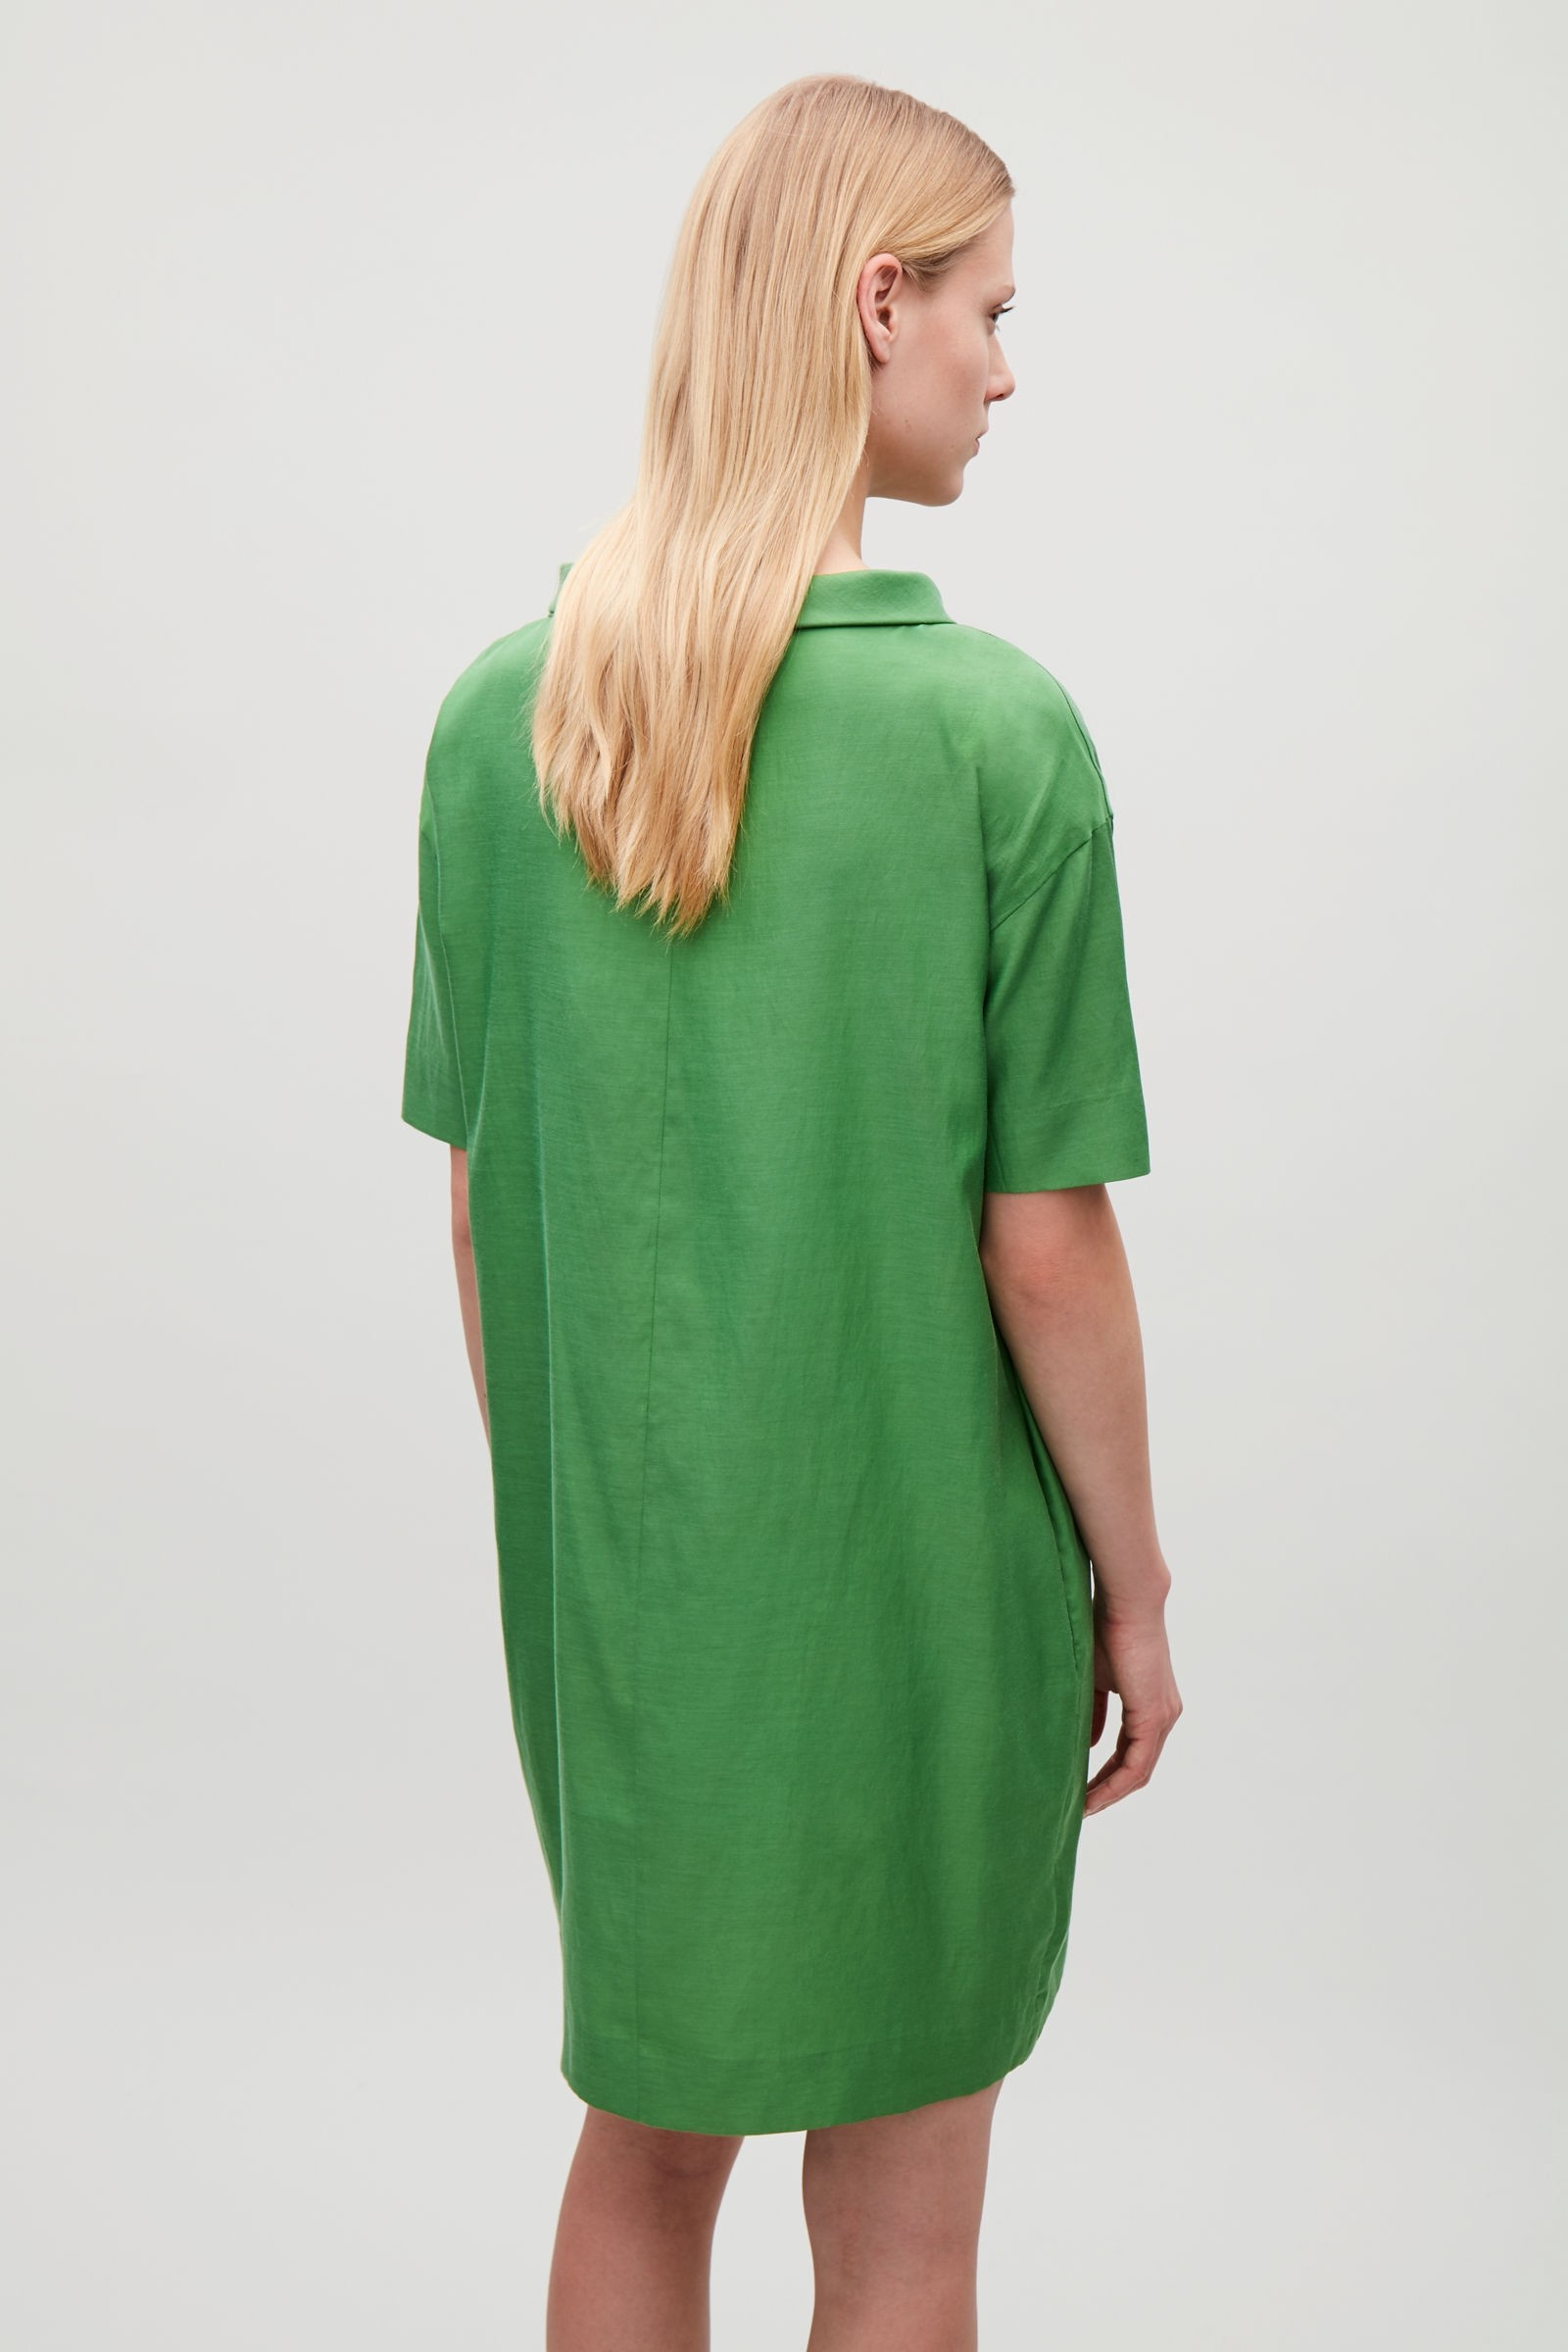 b946f92652f64 FOLDED-COLLAR DRAPED DRESS - green by COS